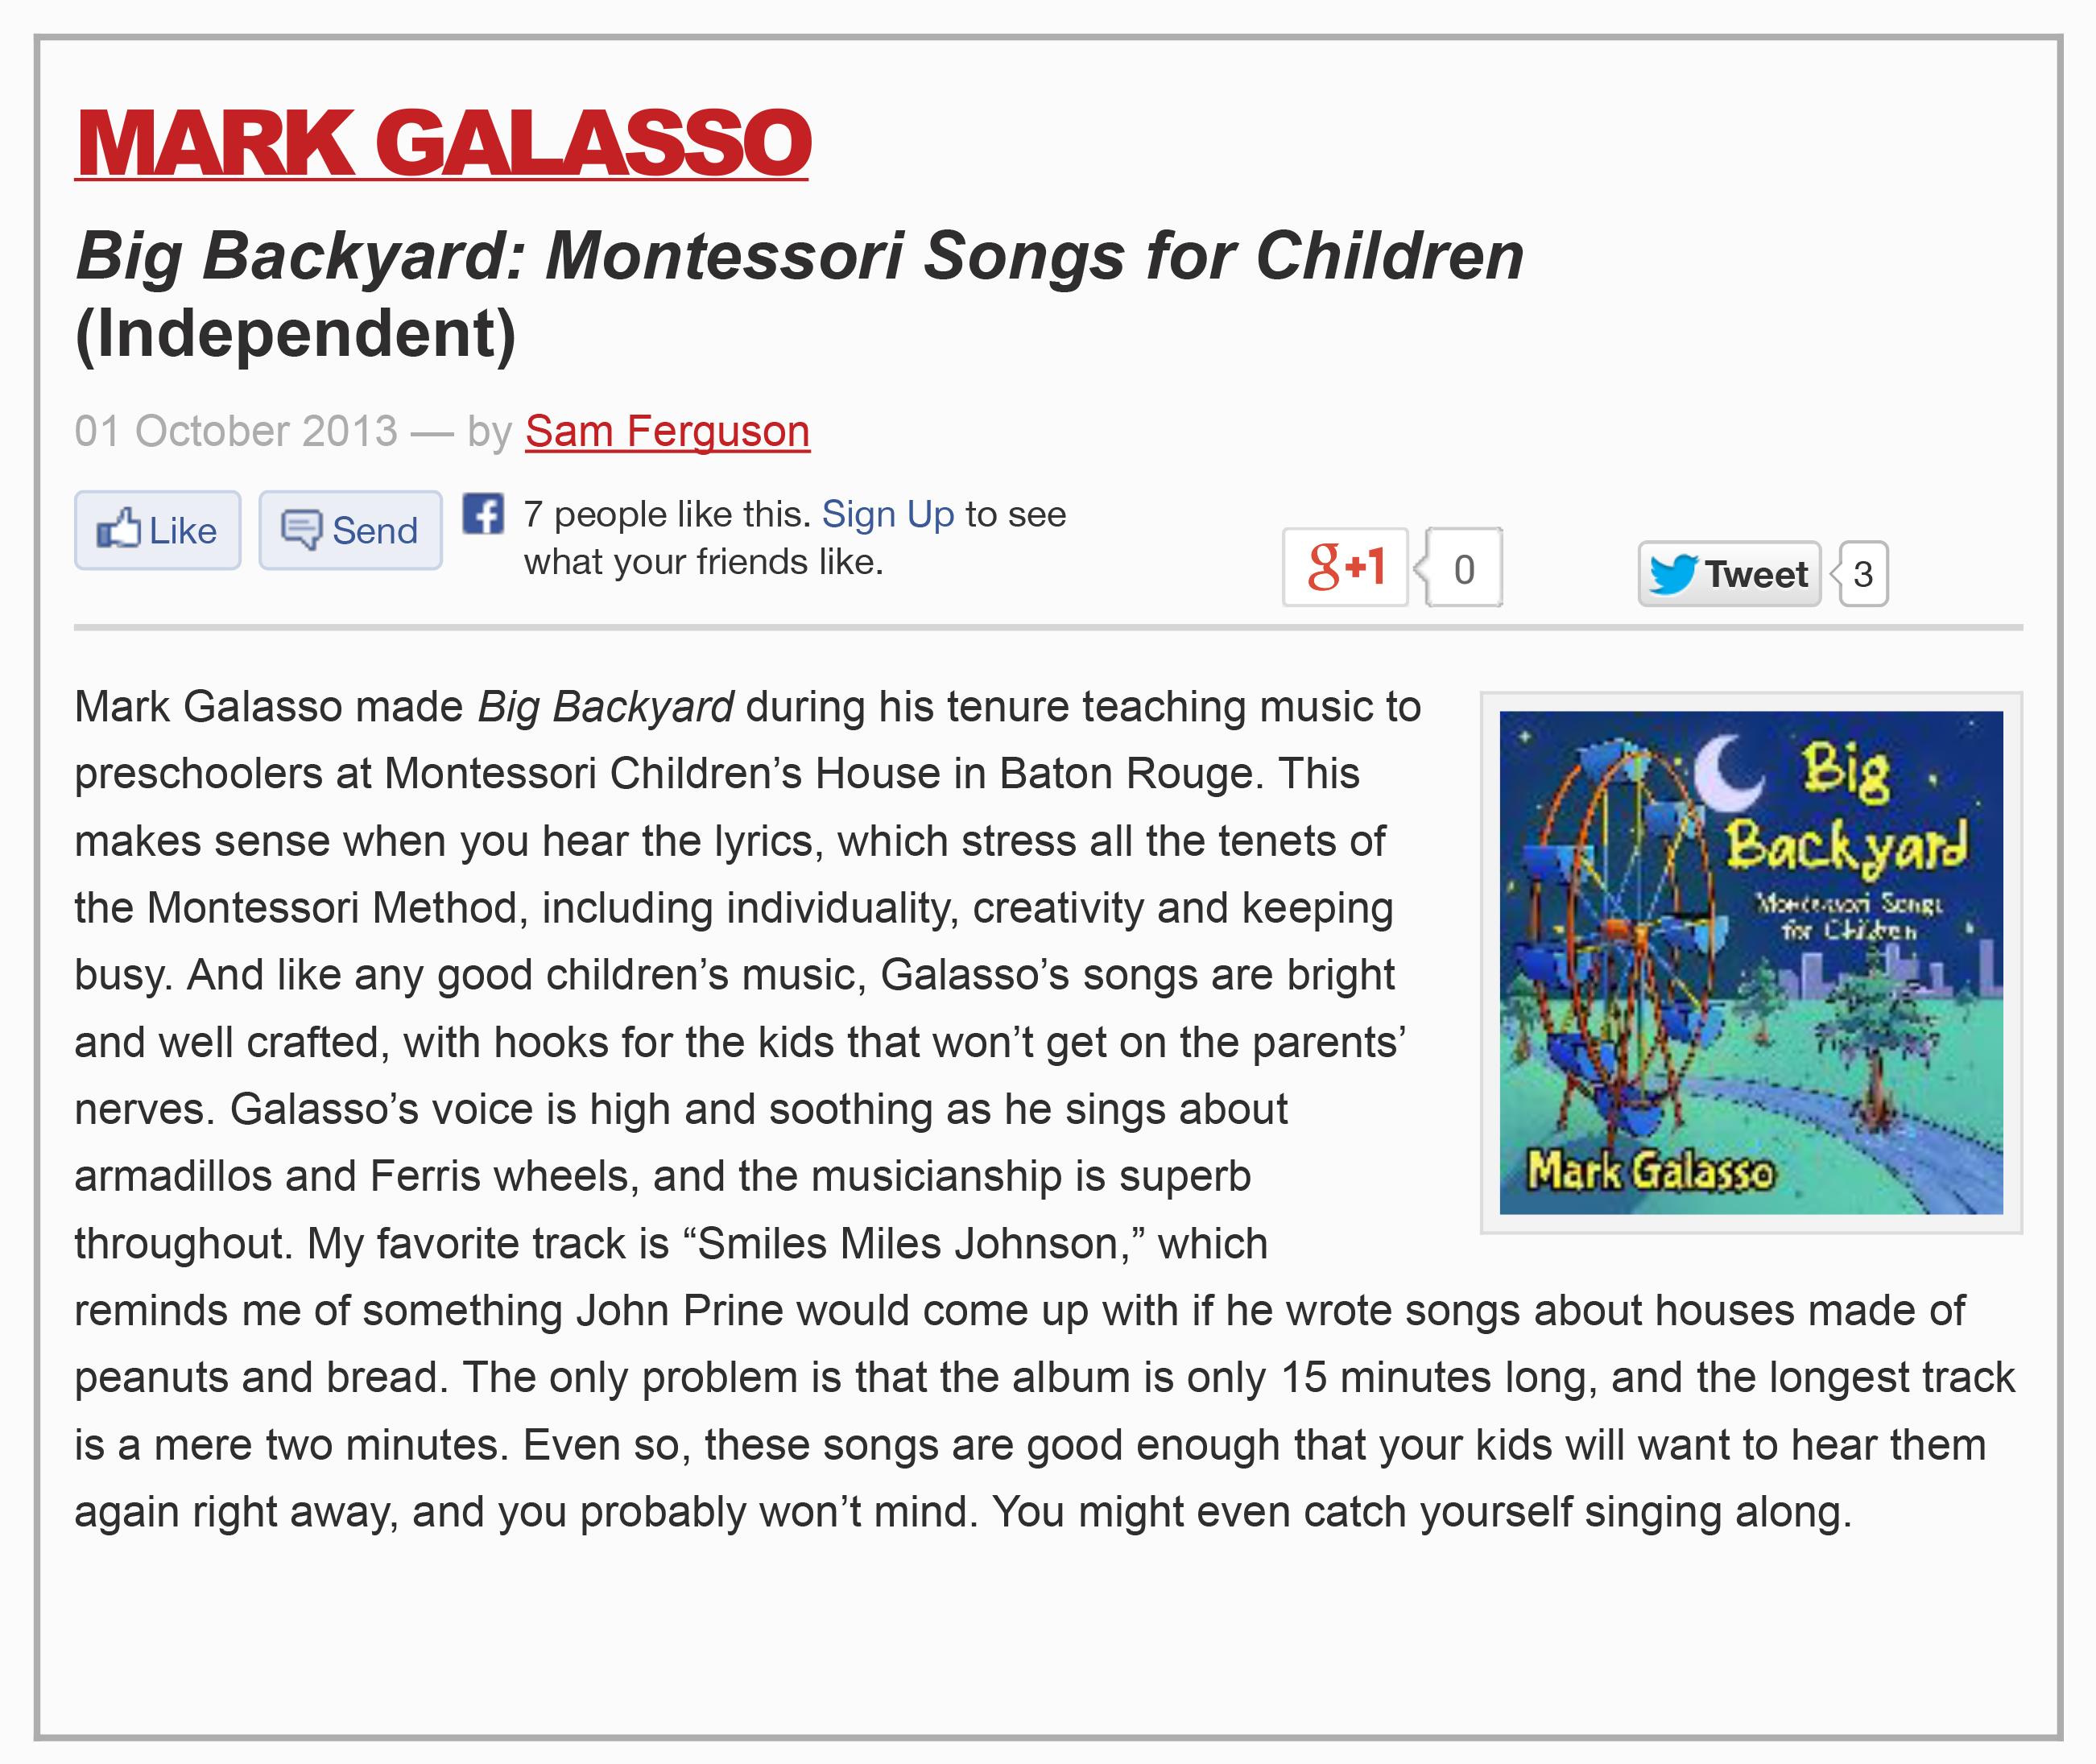 Mark Galasso Big Backyard Montessori Songs for Children (Album Review)-1